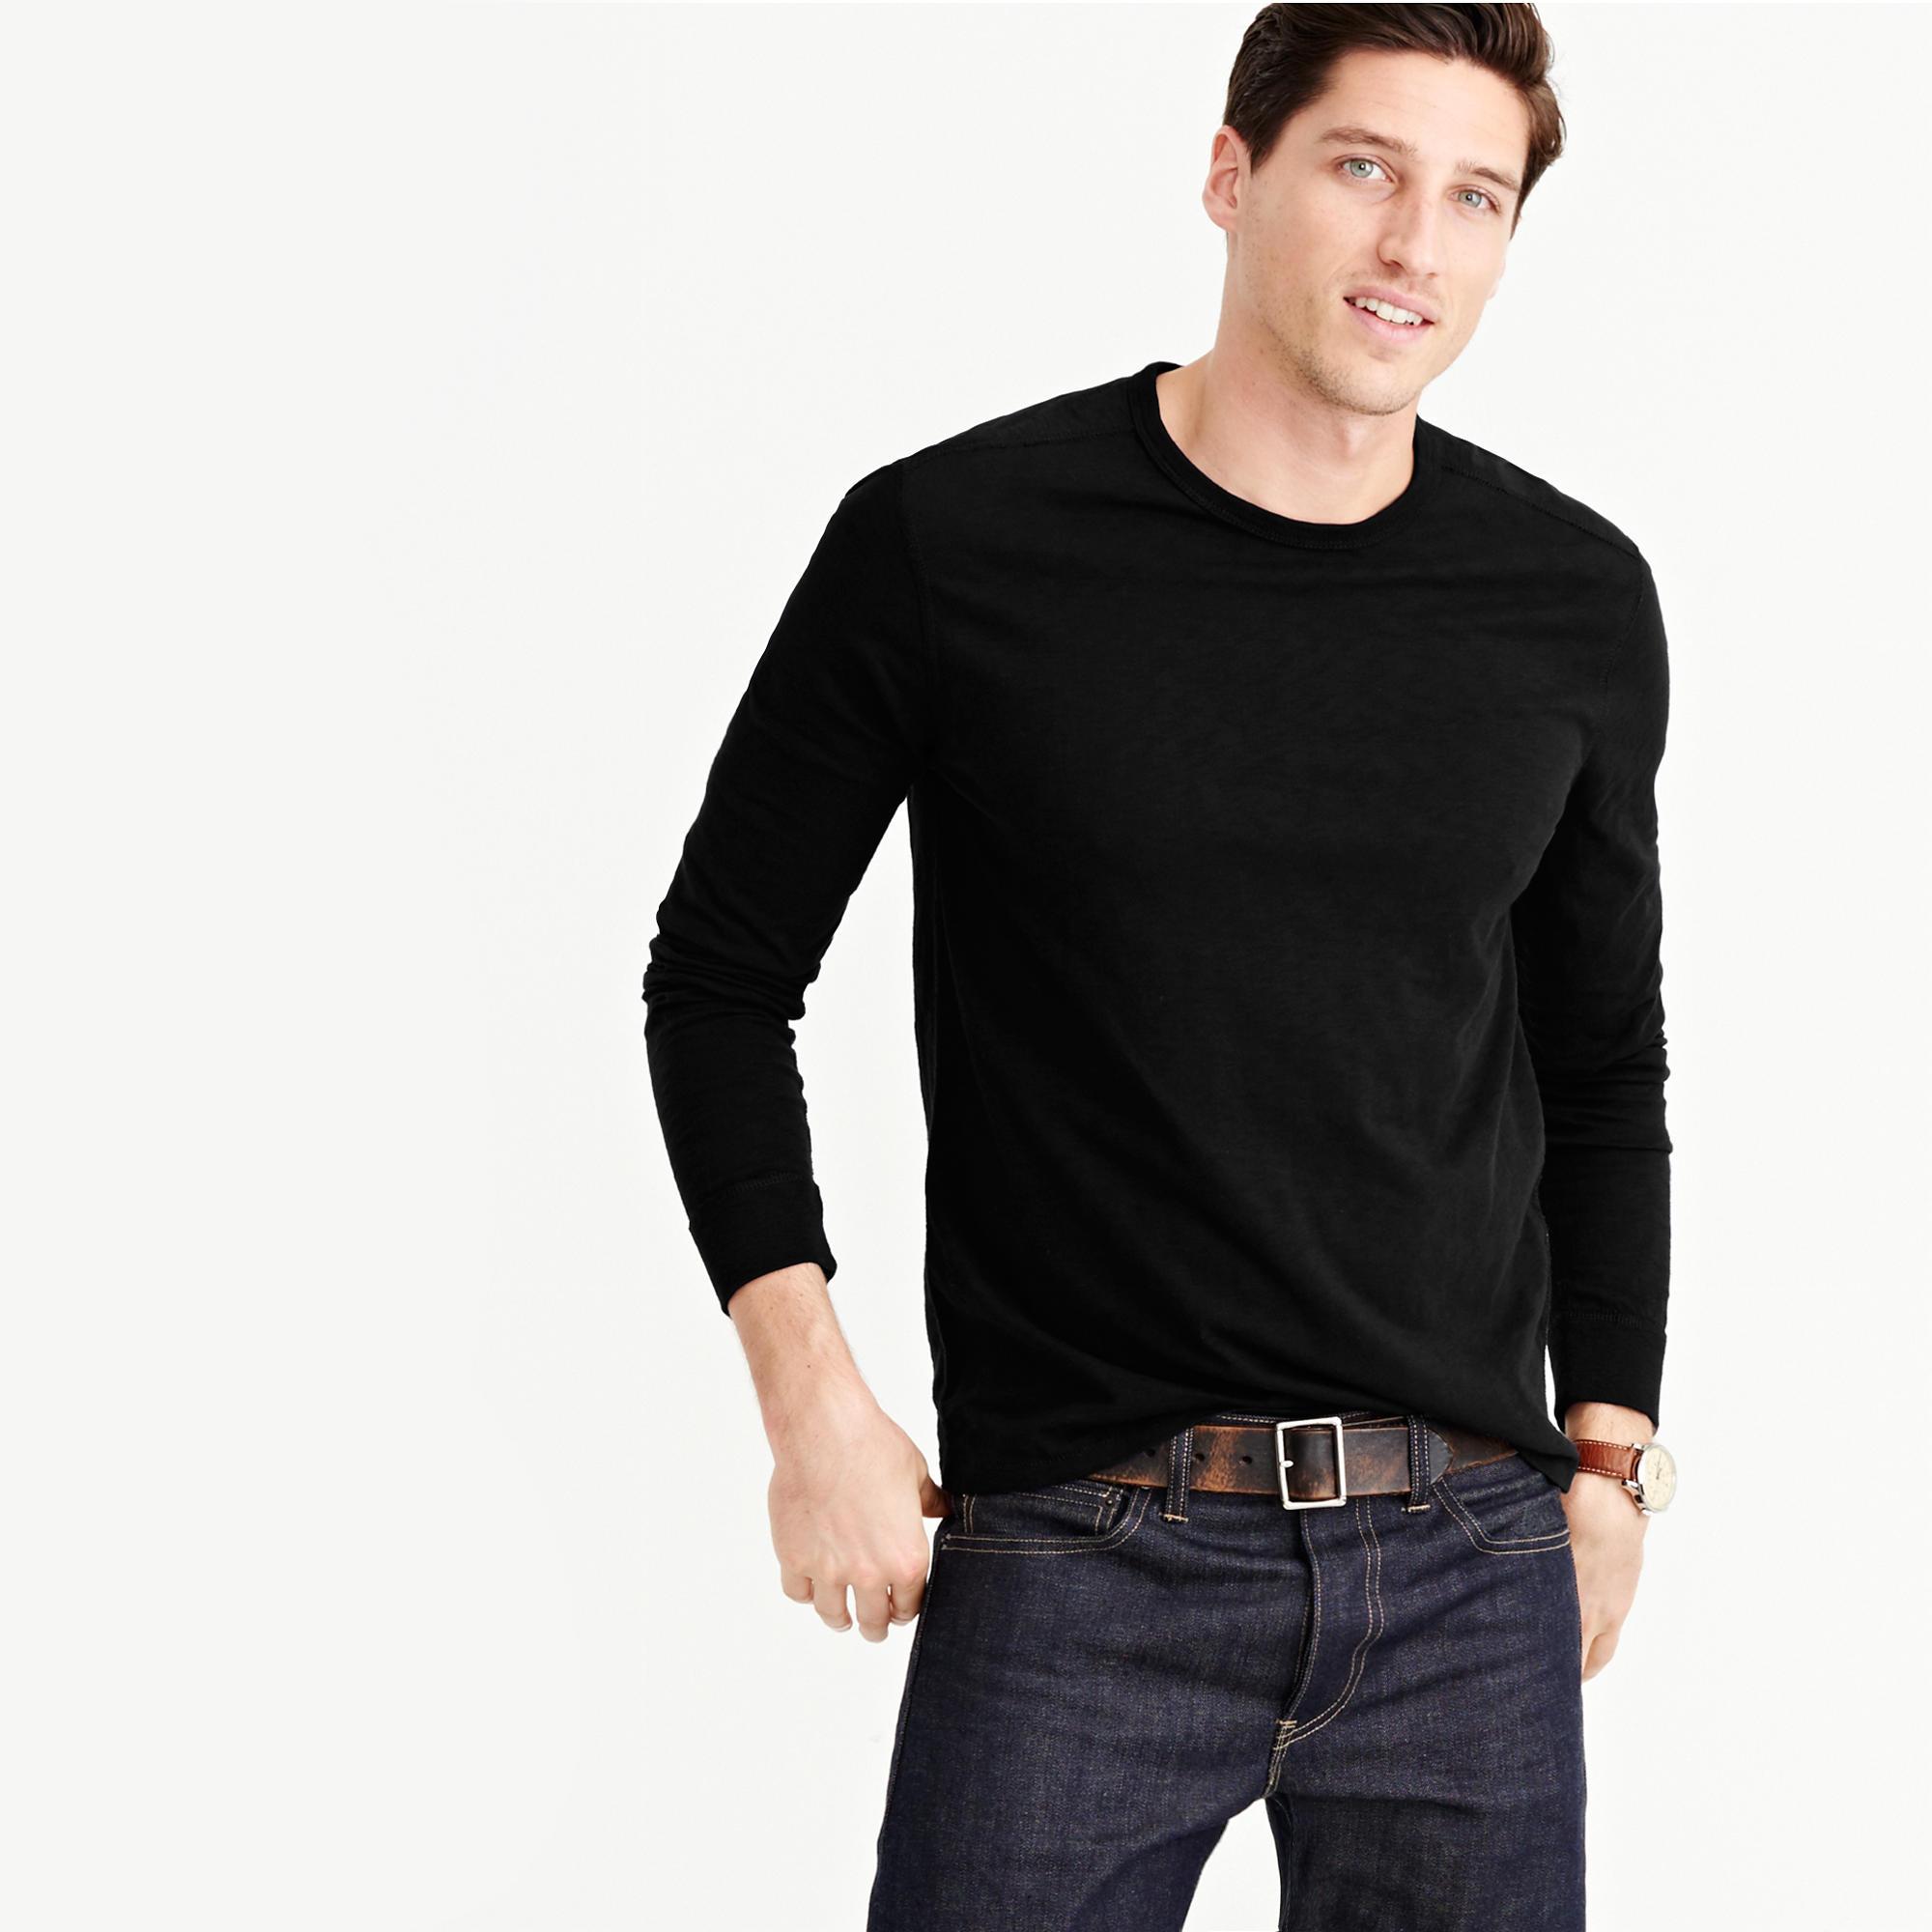 J.crew Men's Long-sleeve Textured Cotton T-shirt (White / Navy)